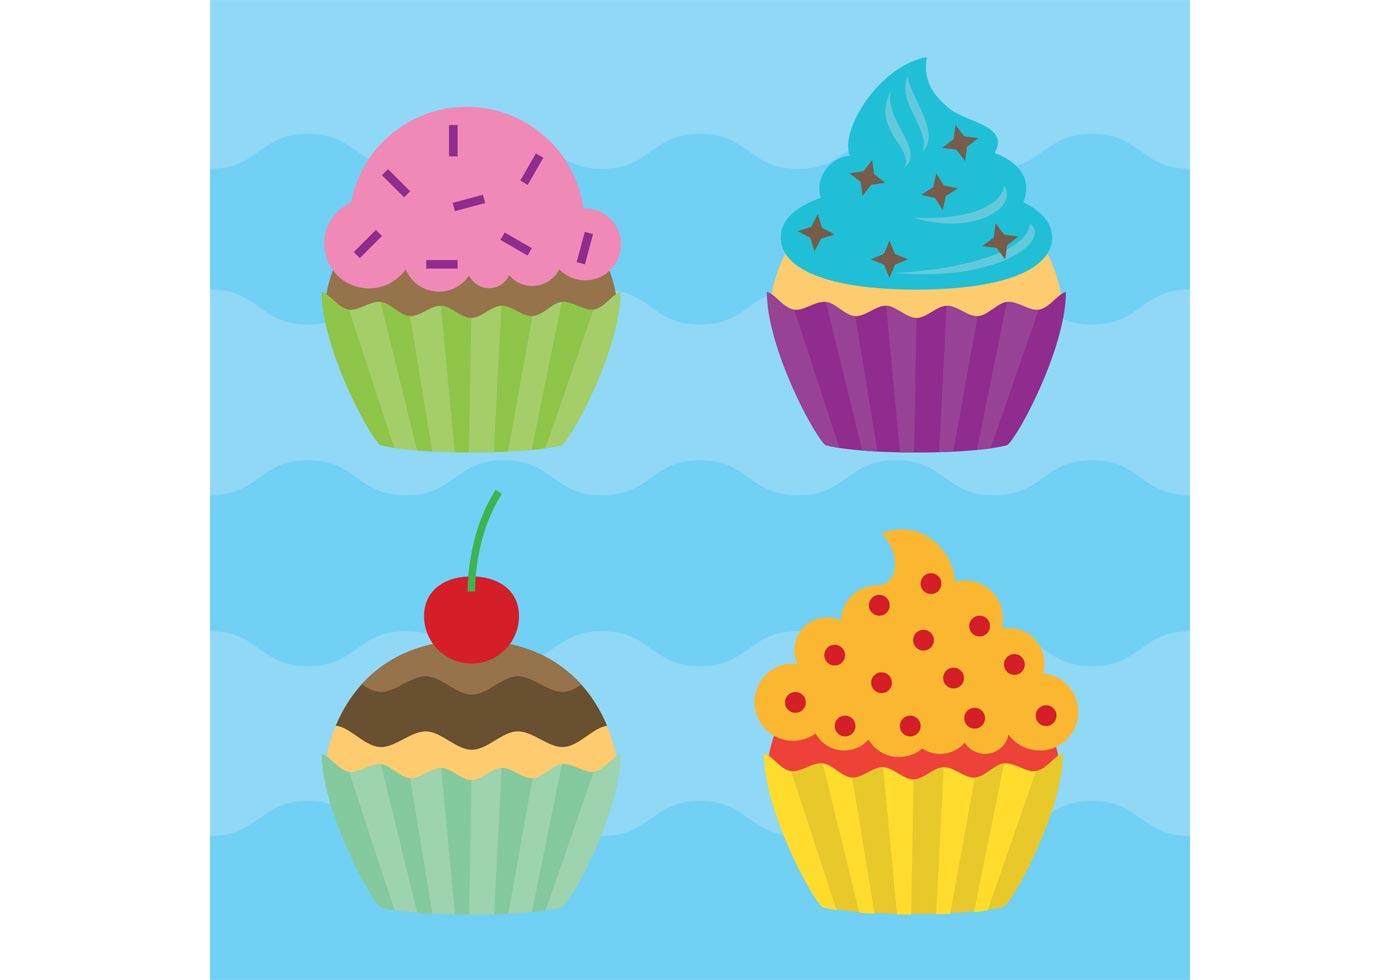 Cute Bakery Wallpaper Cupcake Vectors Download Free Vector Art Stock Graphics